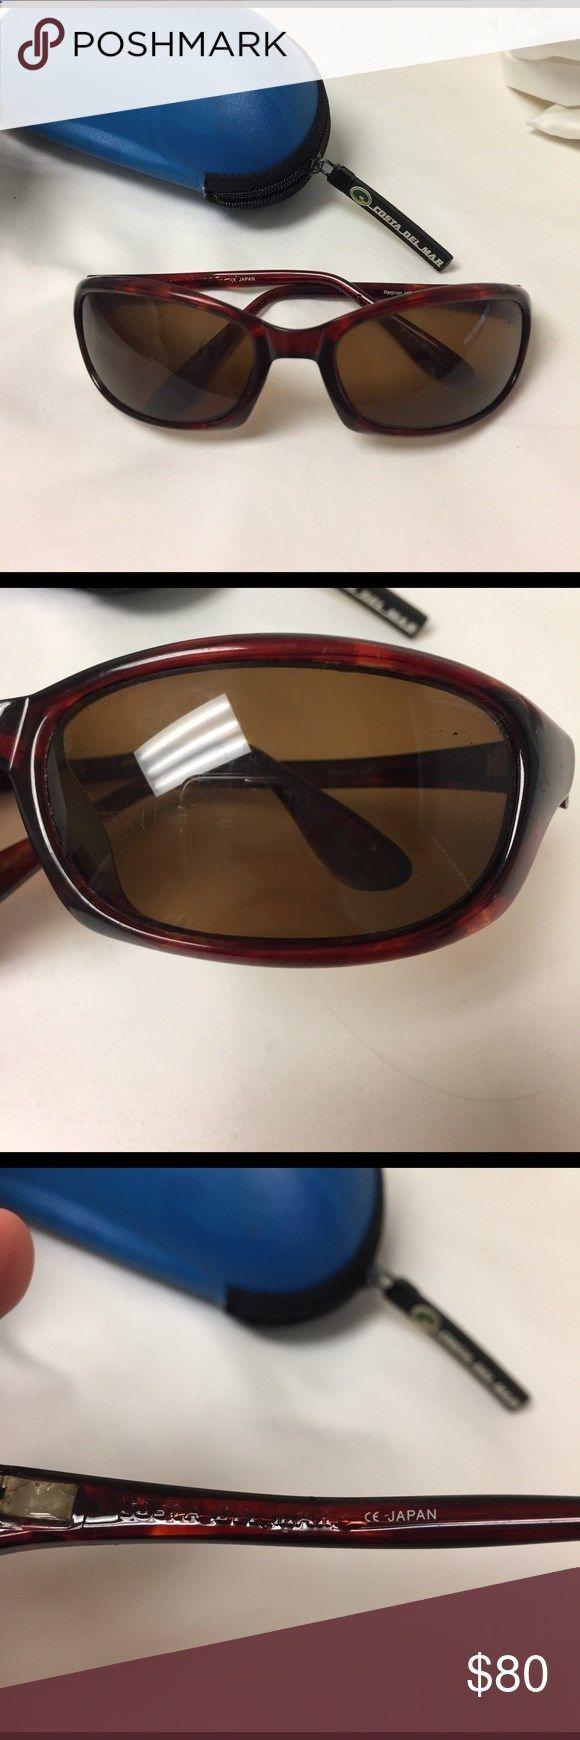 Fishing Sunglasses - Costa Del Mar Harpoon Sunglasses Costa Del Mar Harpoon Sunglasses. Sporty fishing glasses. Unisex. Worn but good condition. Price neg. Costa Del Mar Accessories Sunglasses